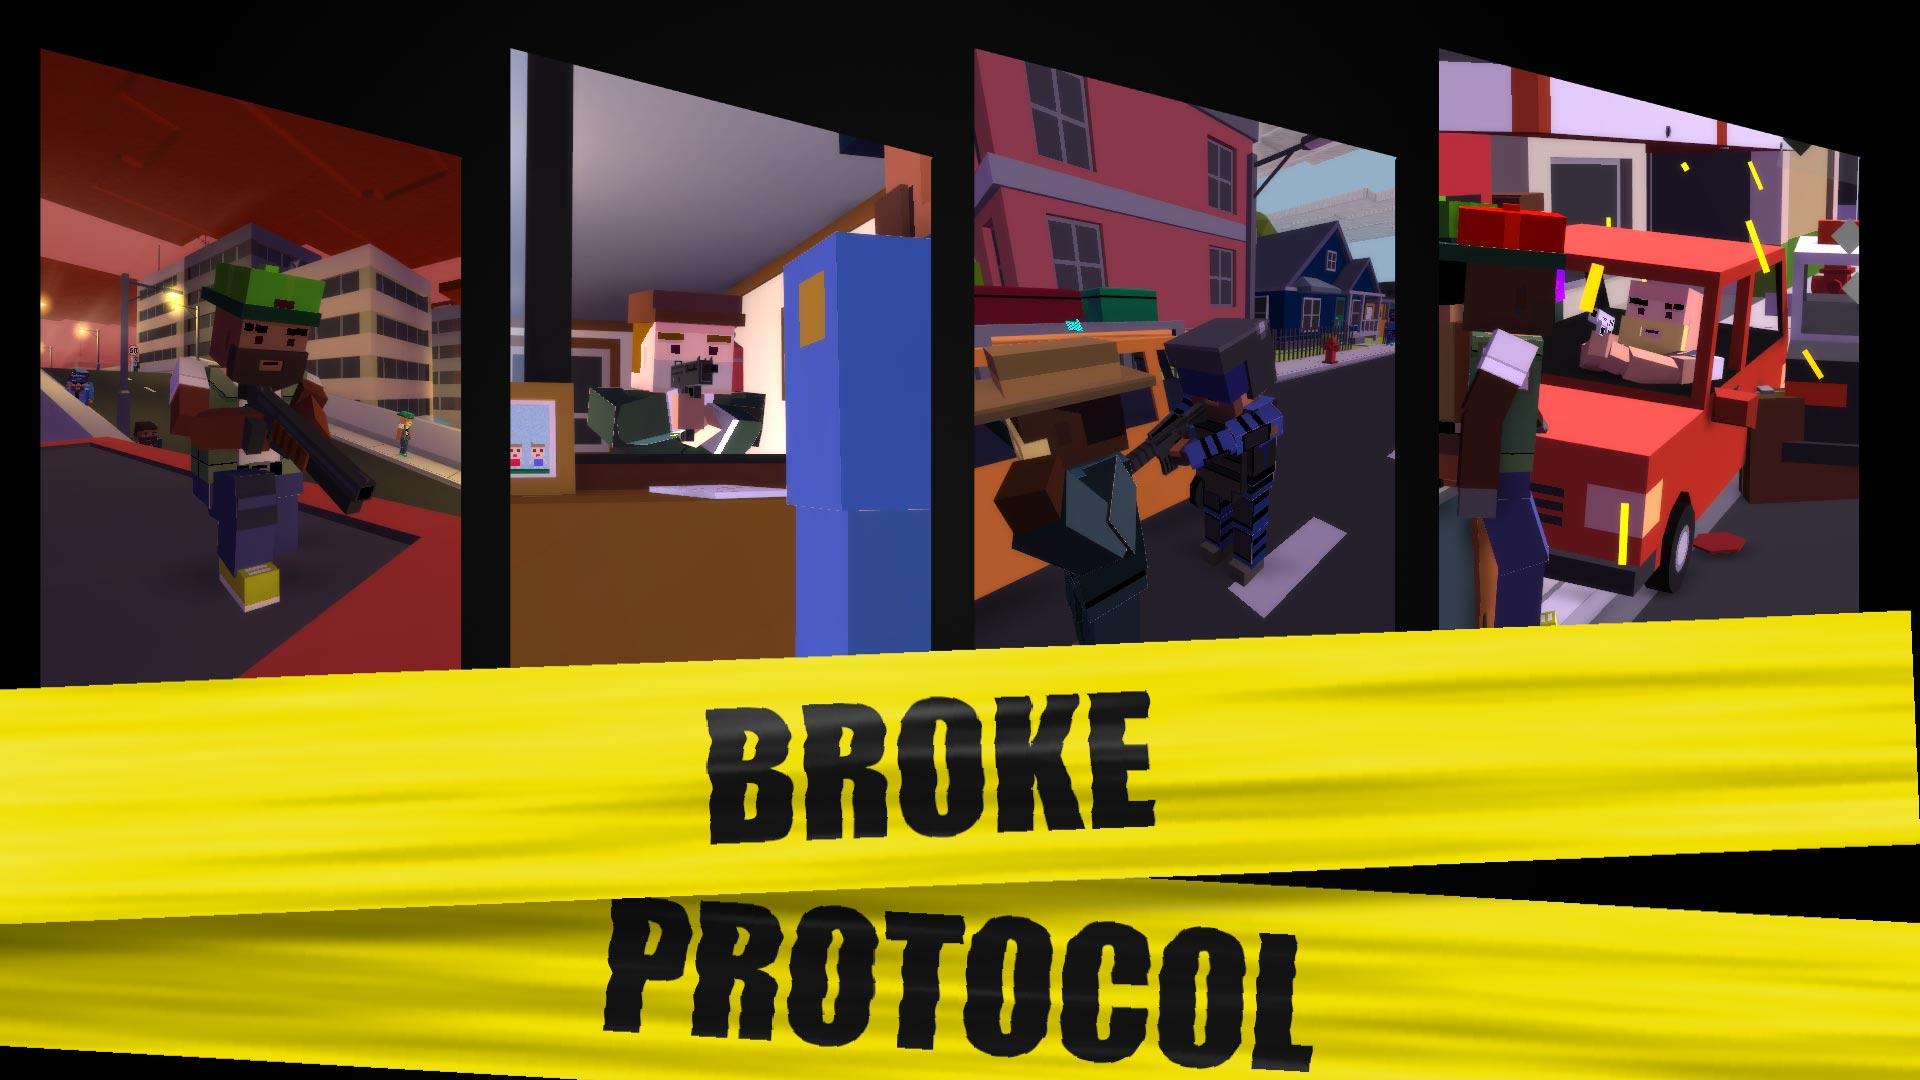 Broke Protocol Wallpaper